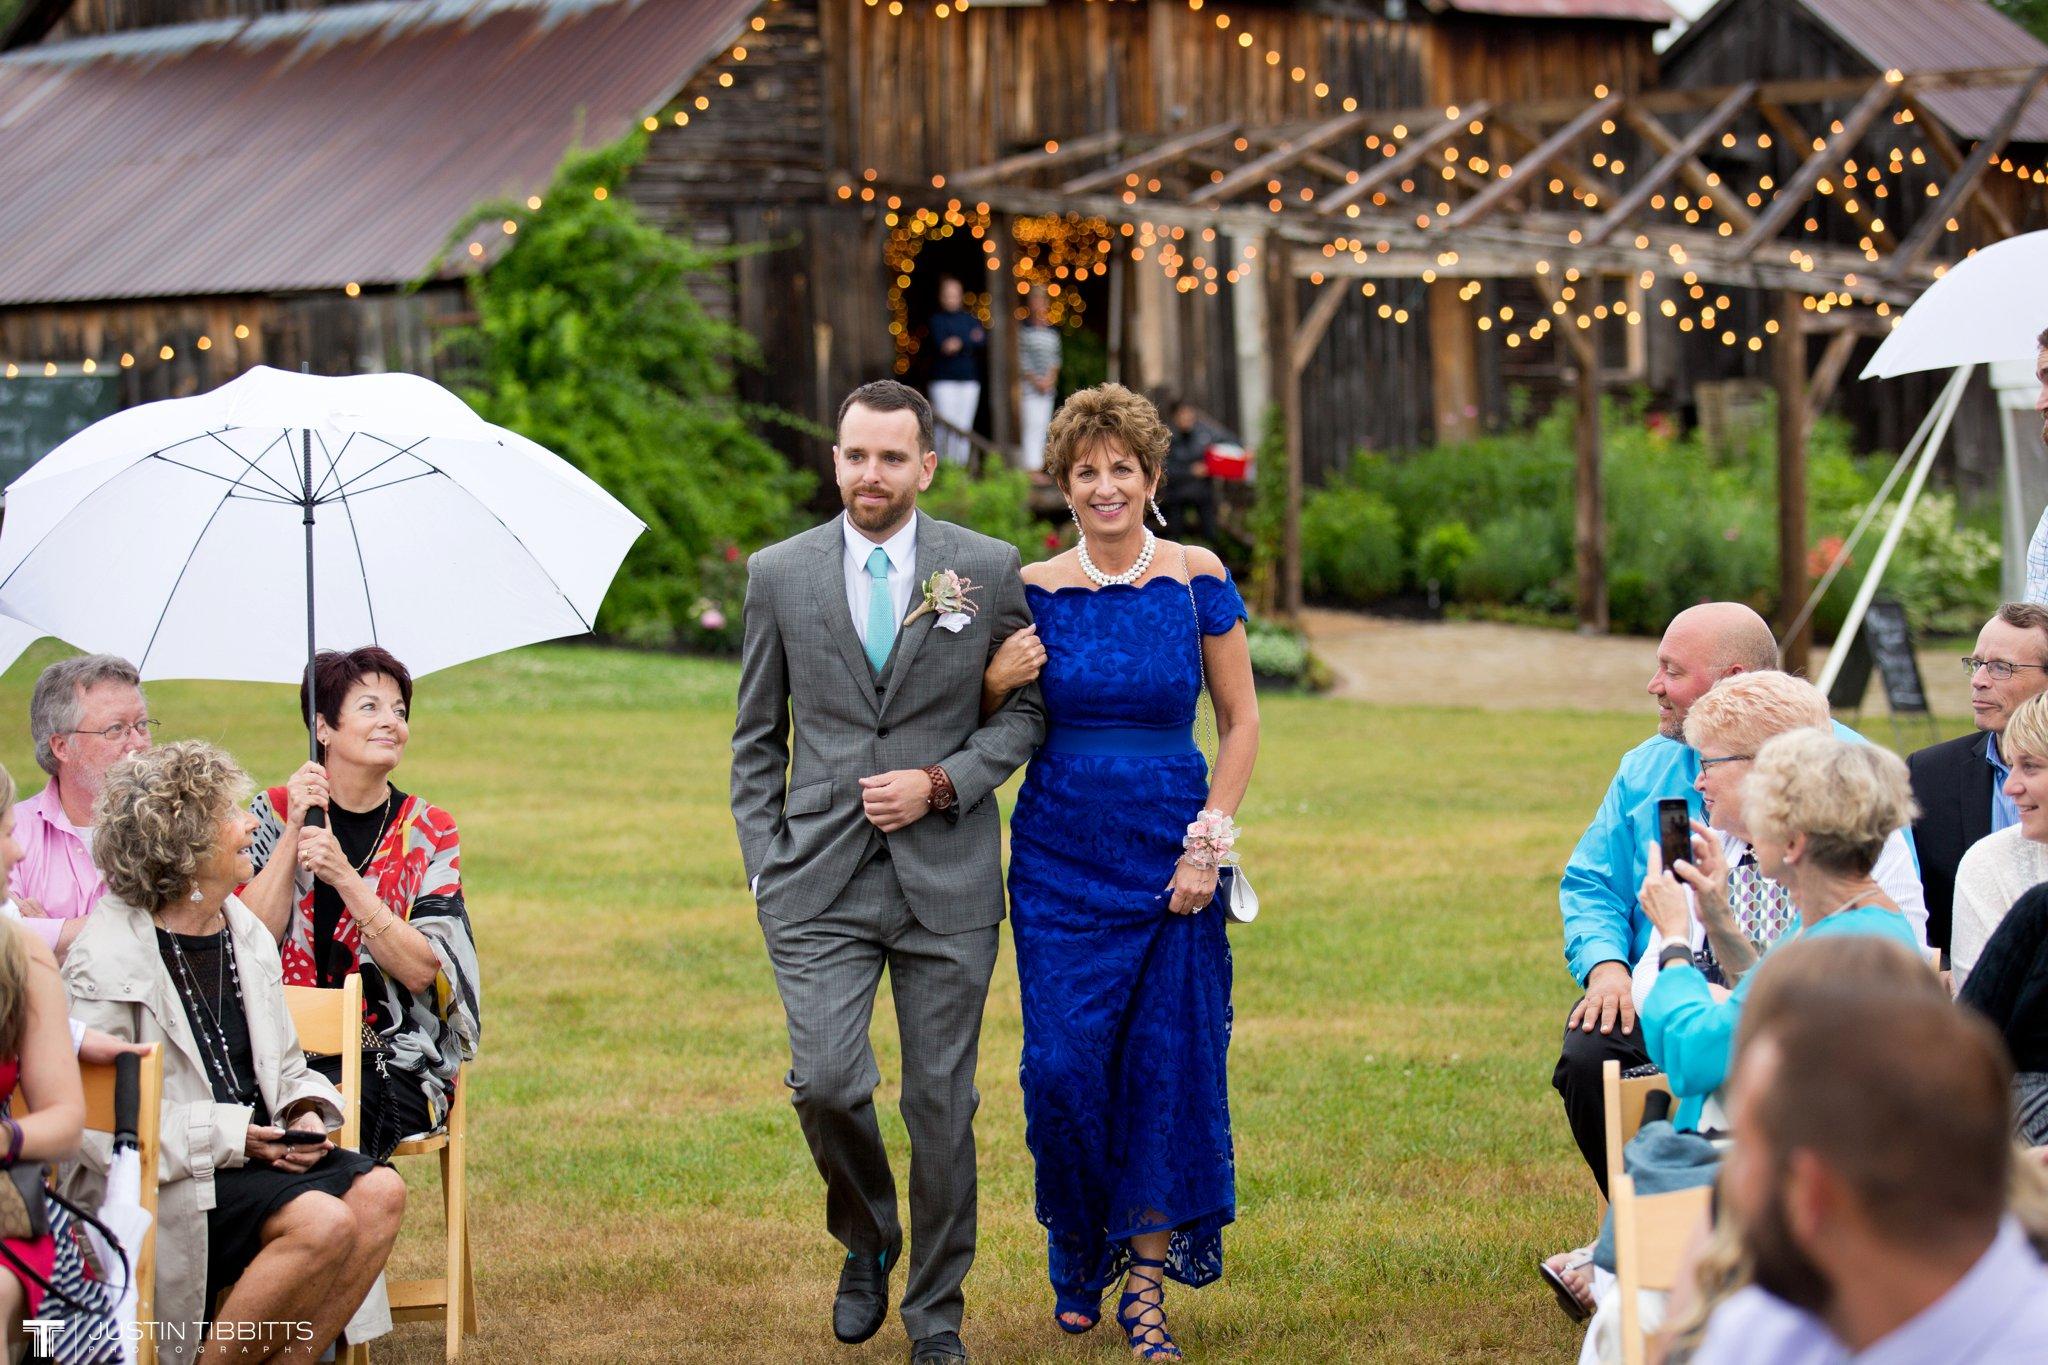 burlap-and-beams-wedding-photos-with-joran-and-molly_0048